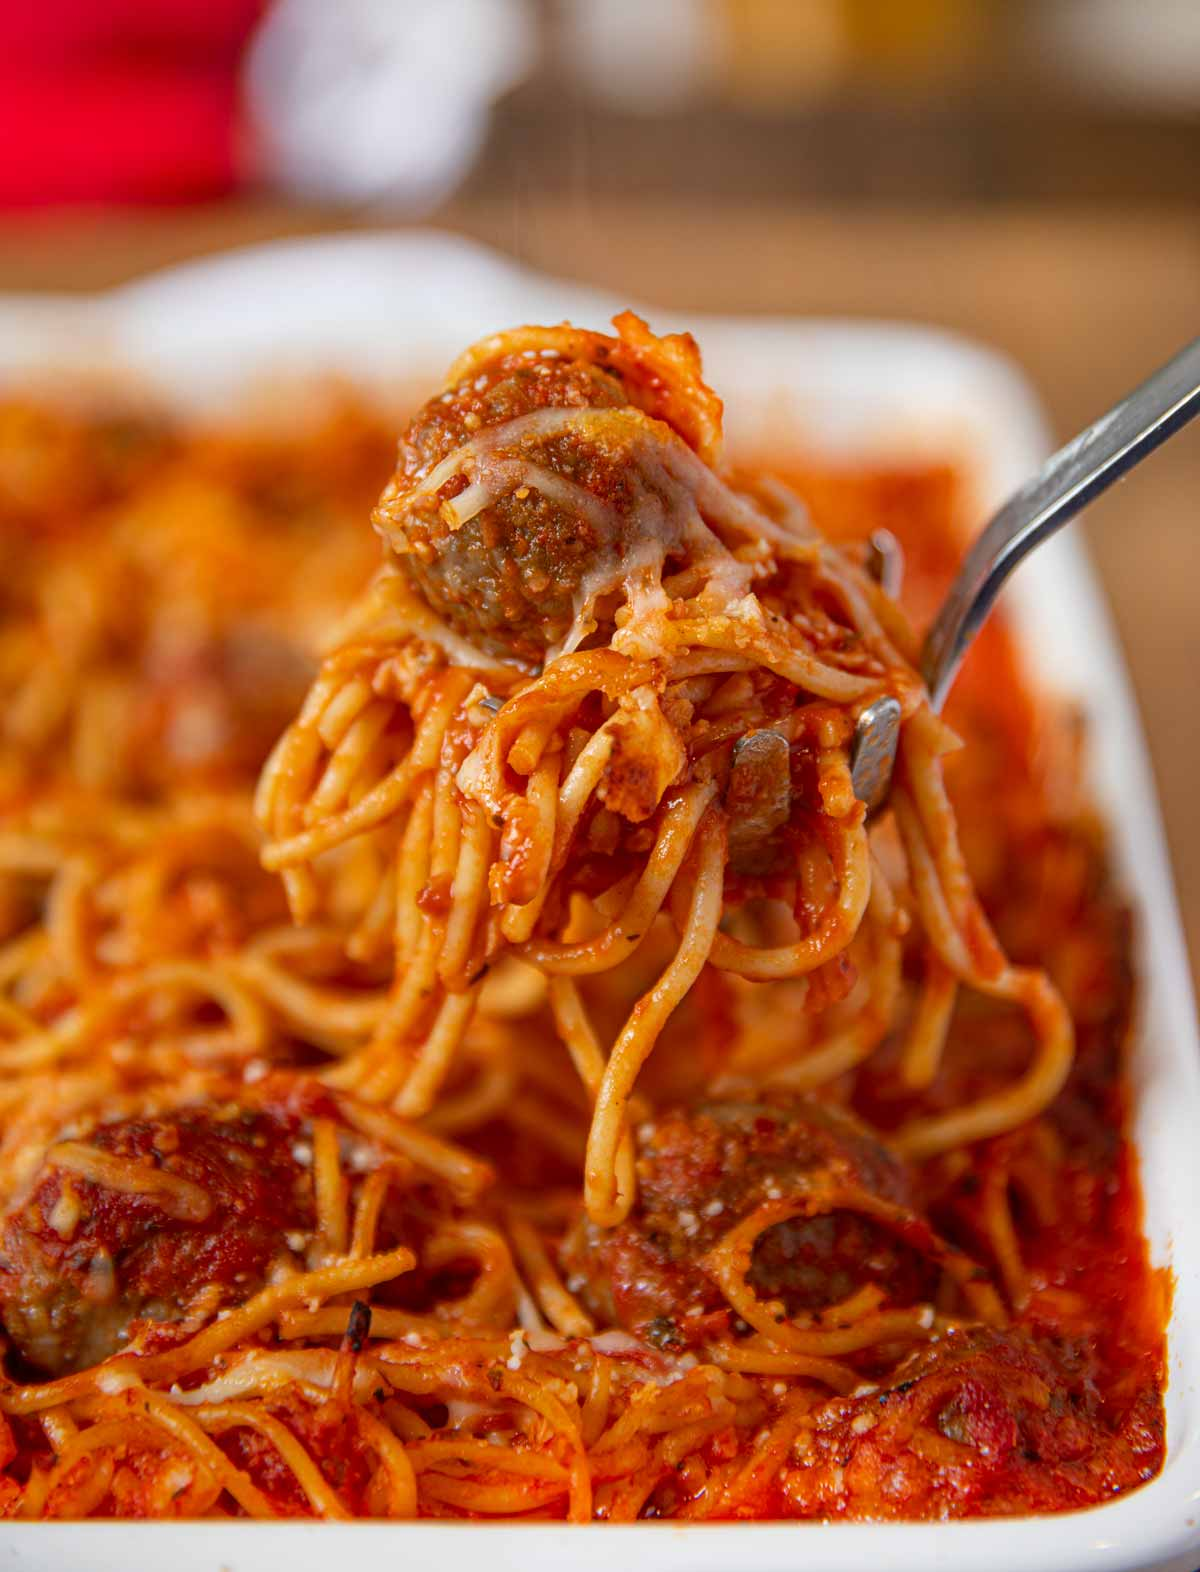 Baked Spaghetti And Meatballs Recipe Dinner Then Dessert